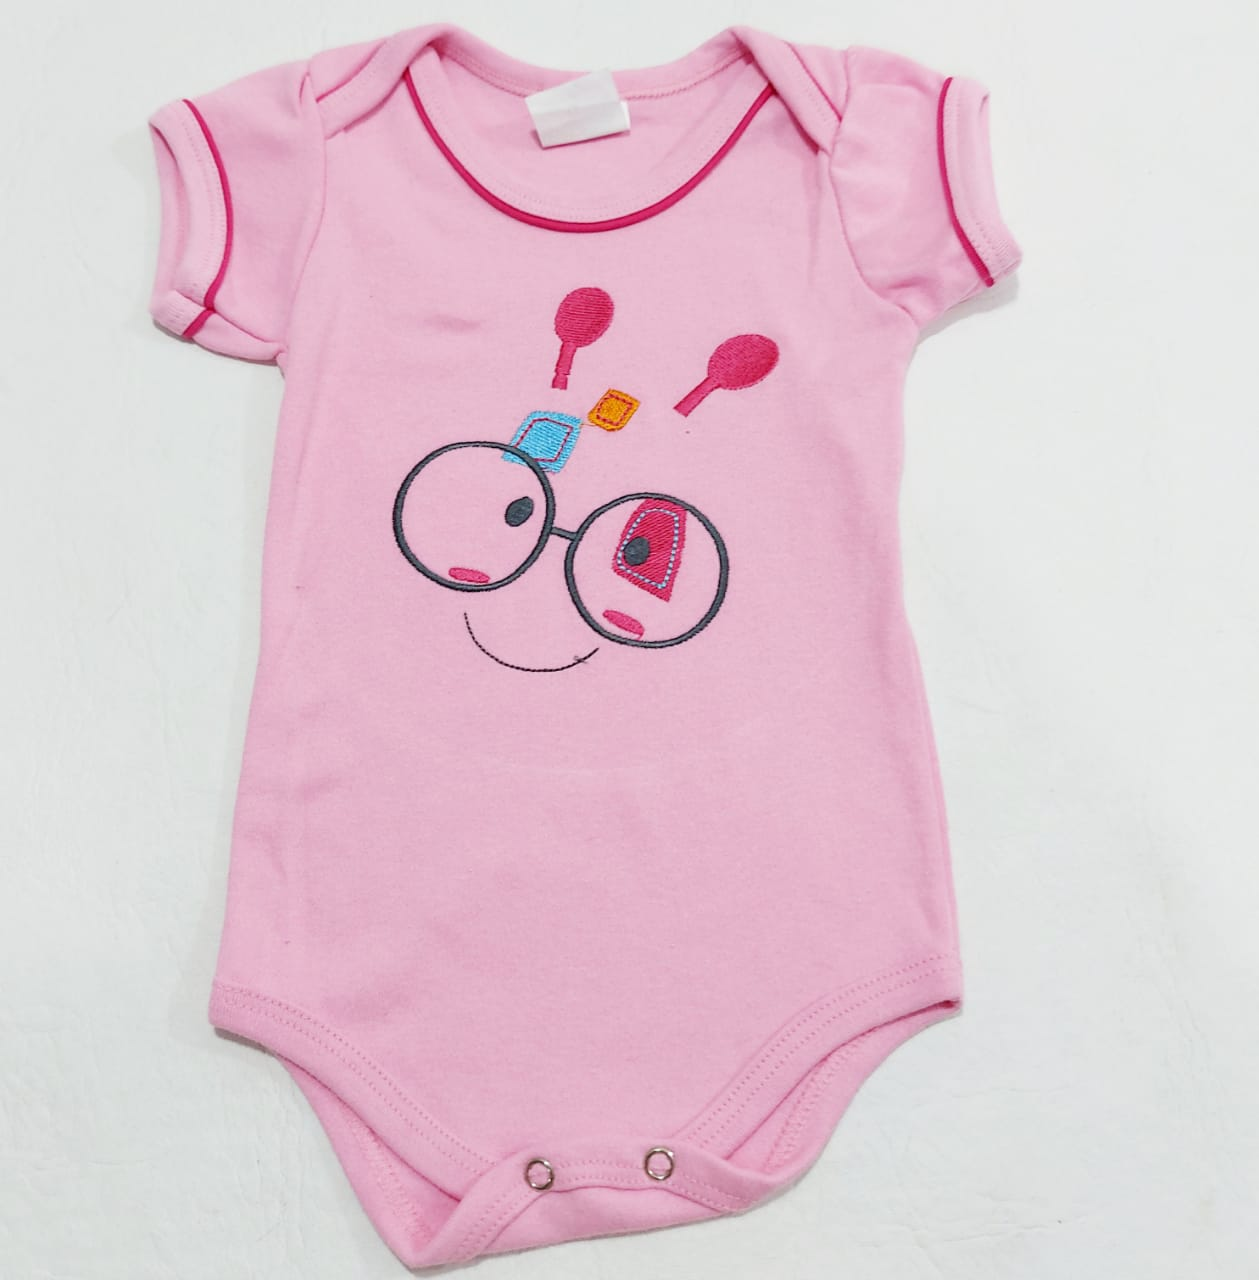 Body Smile - Meia Manga Bordado - 0 à 8 meses - 100% Algodão - Yala Baby